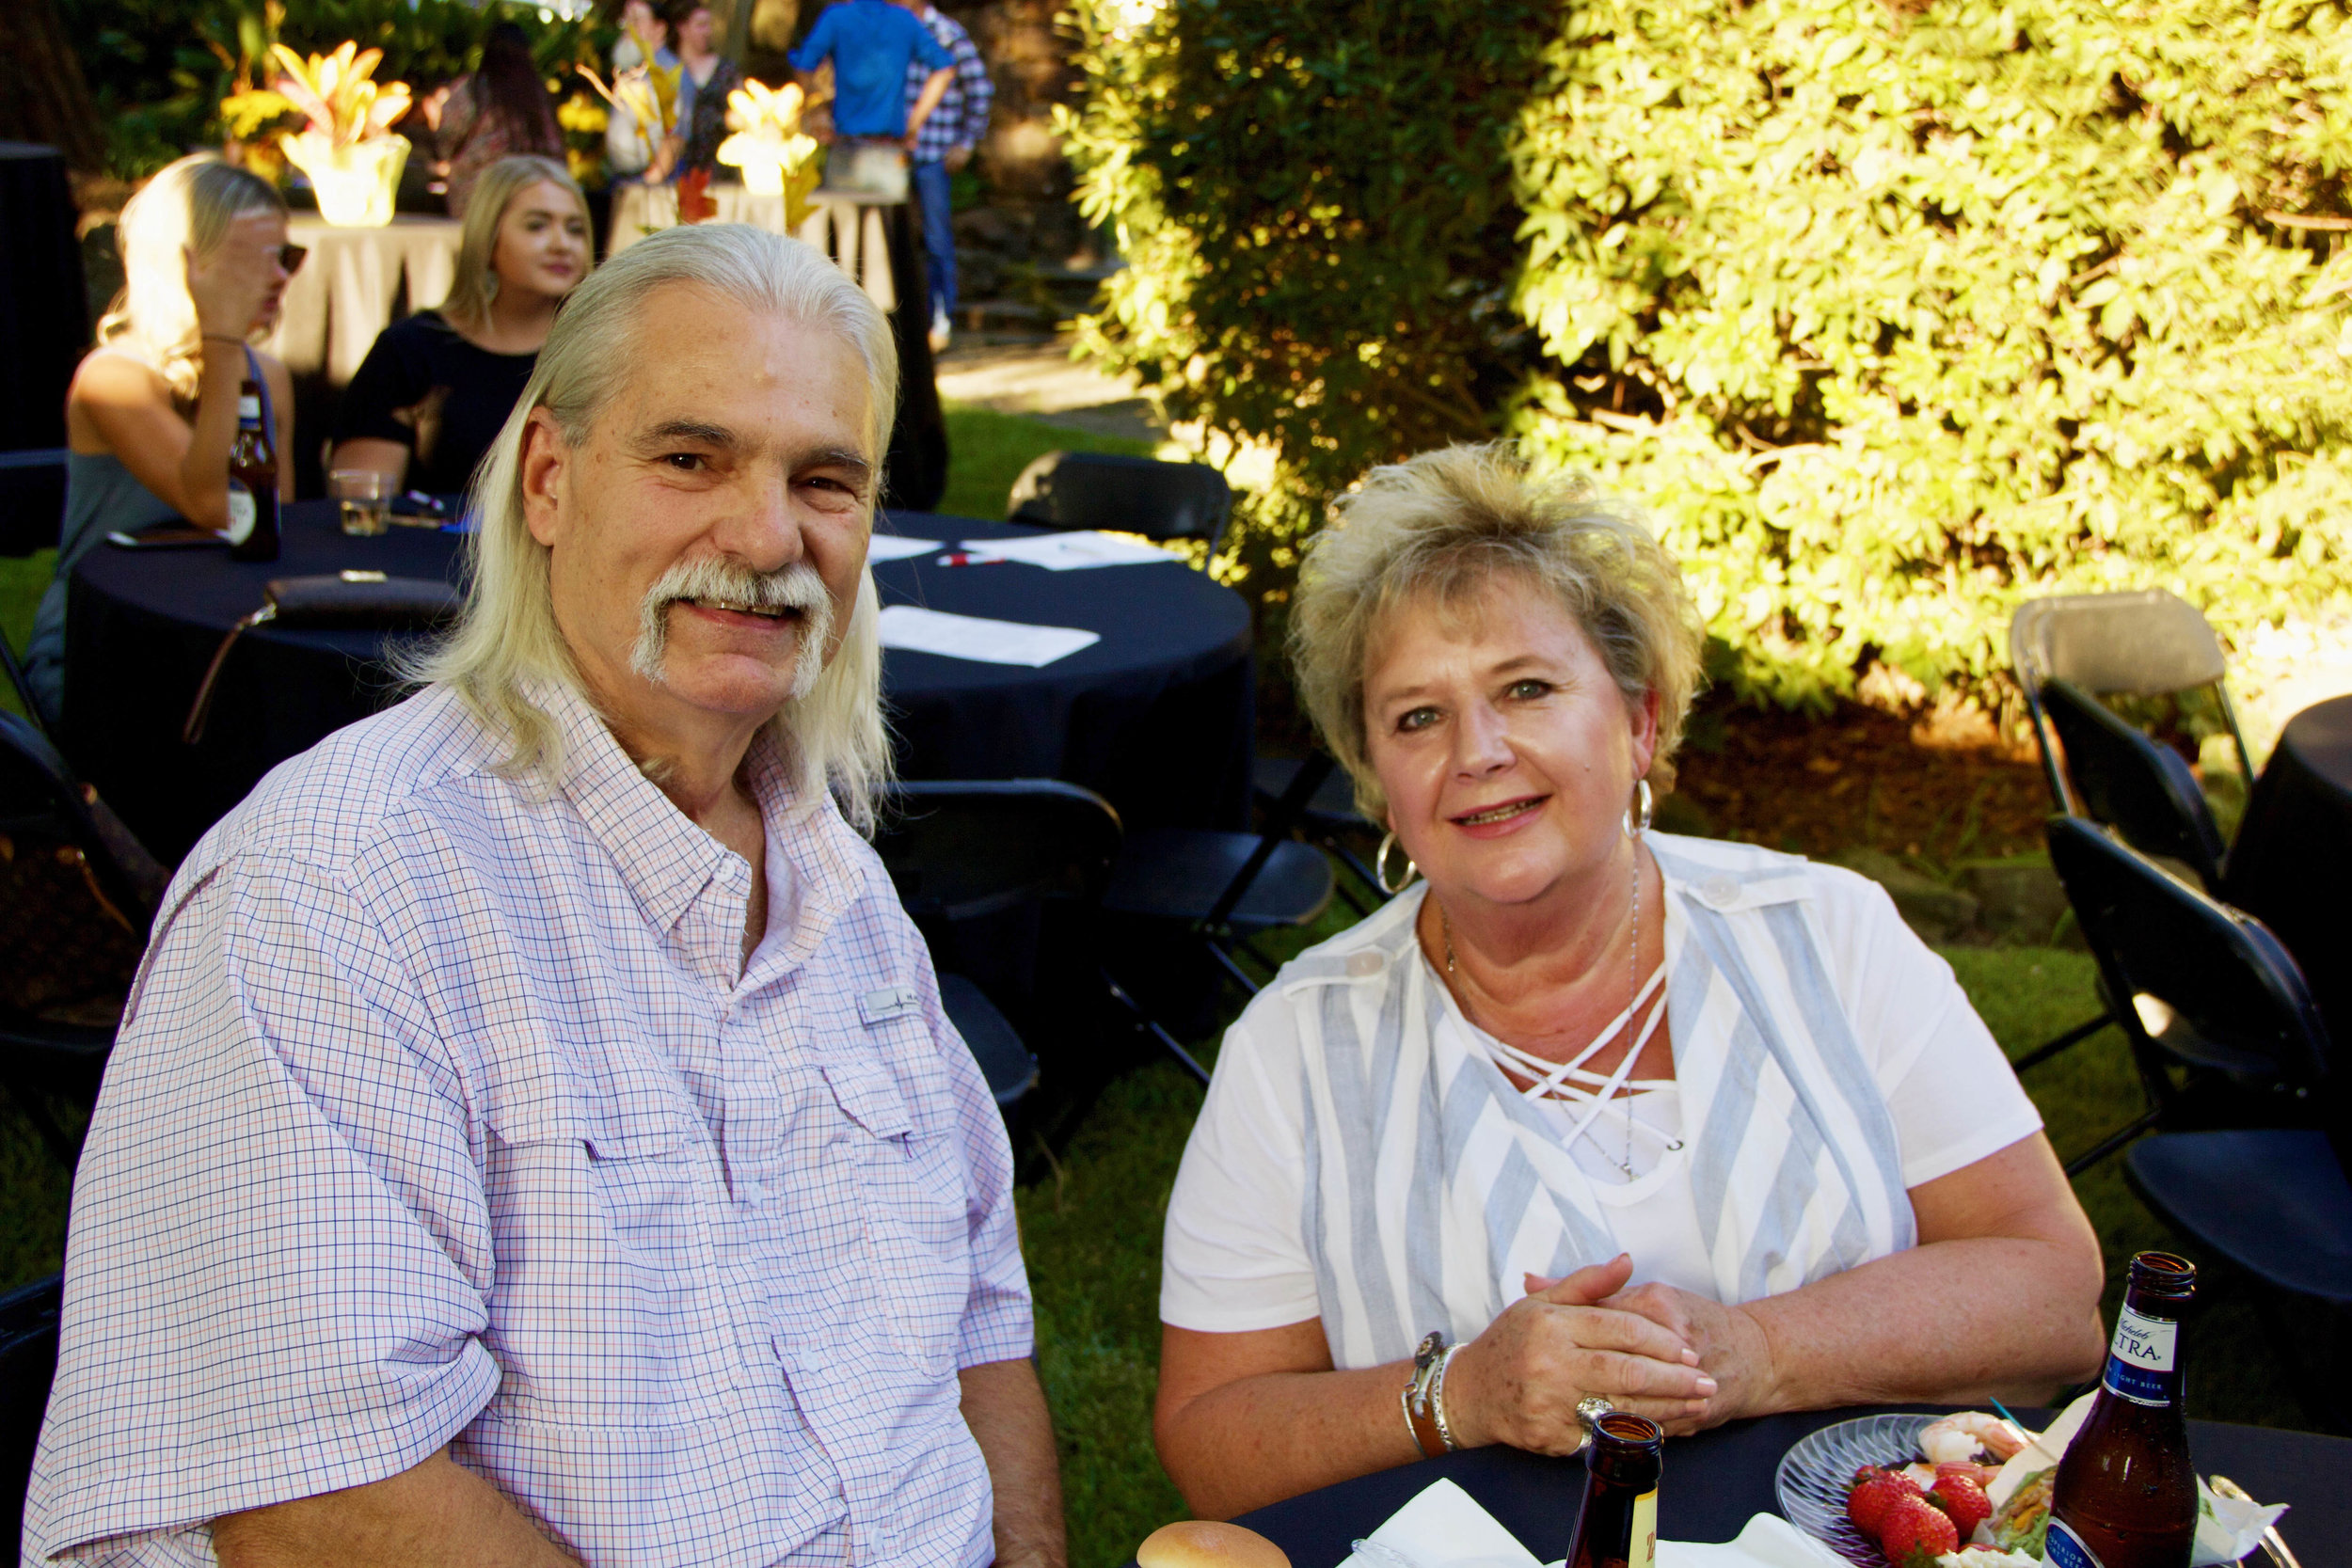 Mike and Rhonda Sangalli